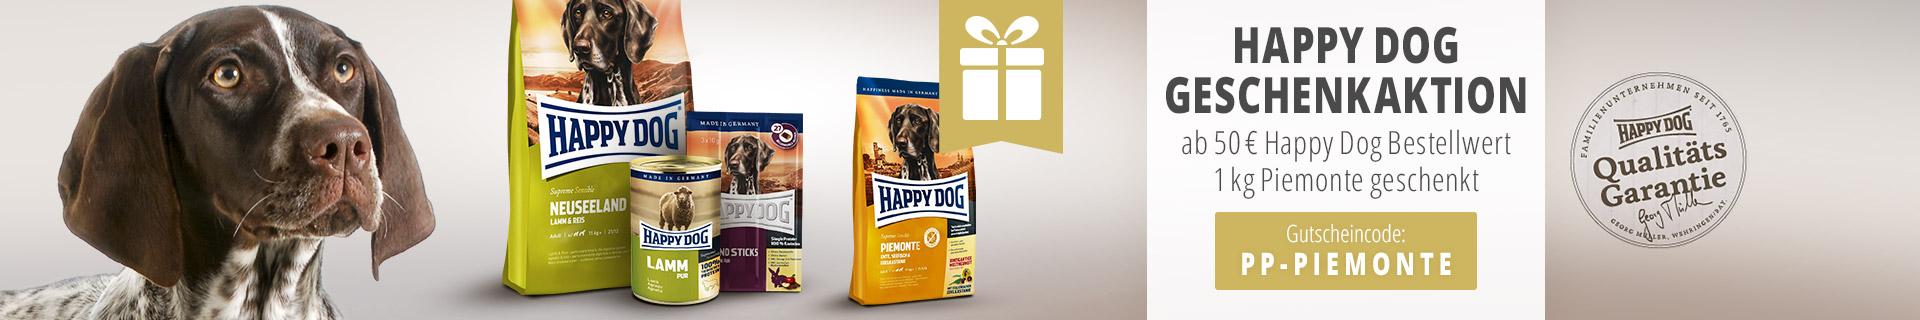 Hapy Dog Aktion Supreme Sensible Piemonte 1kg gratis ab 50Euro Einkauf